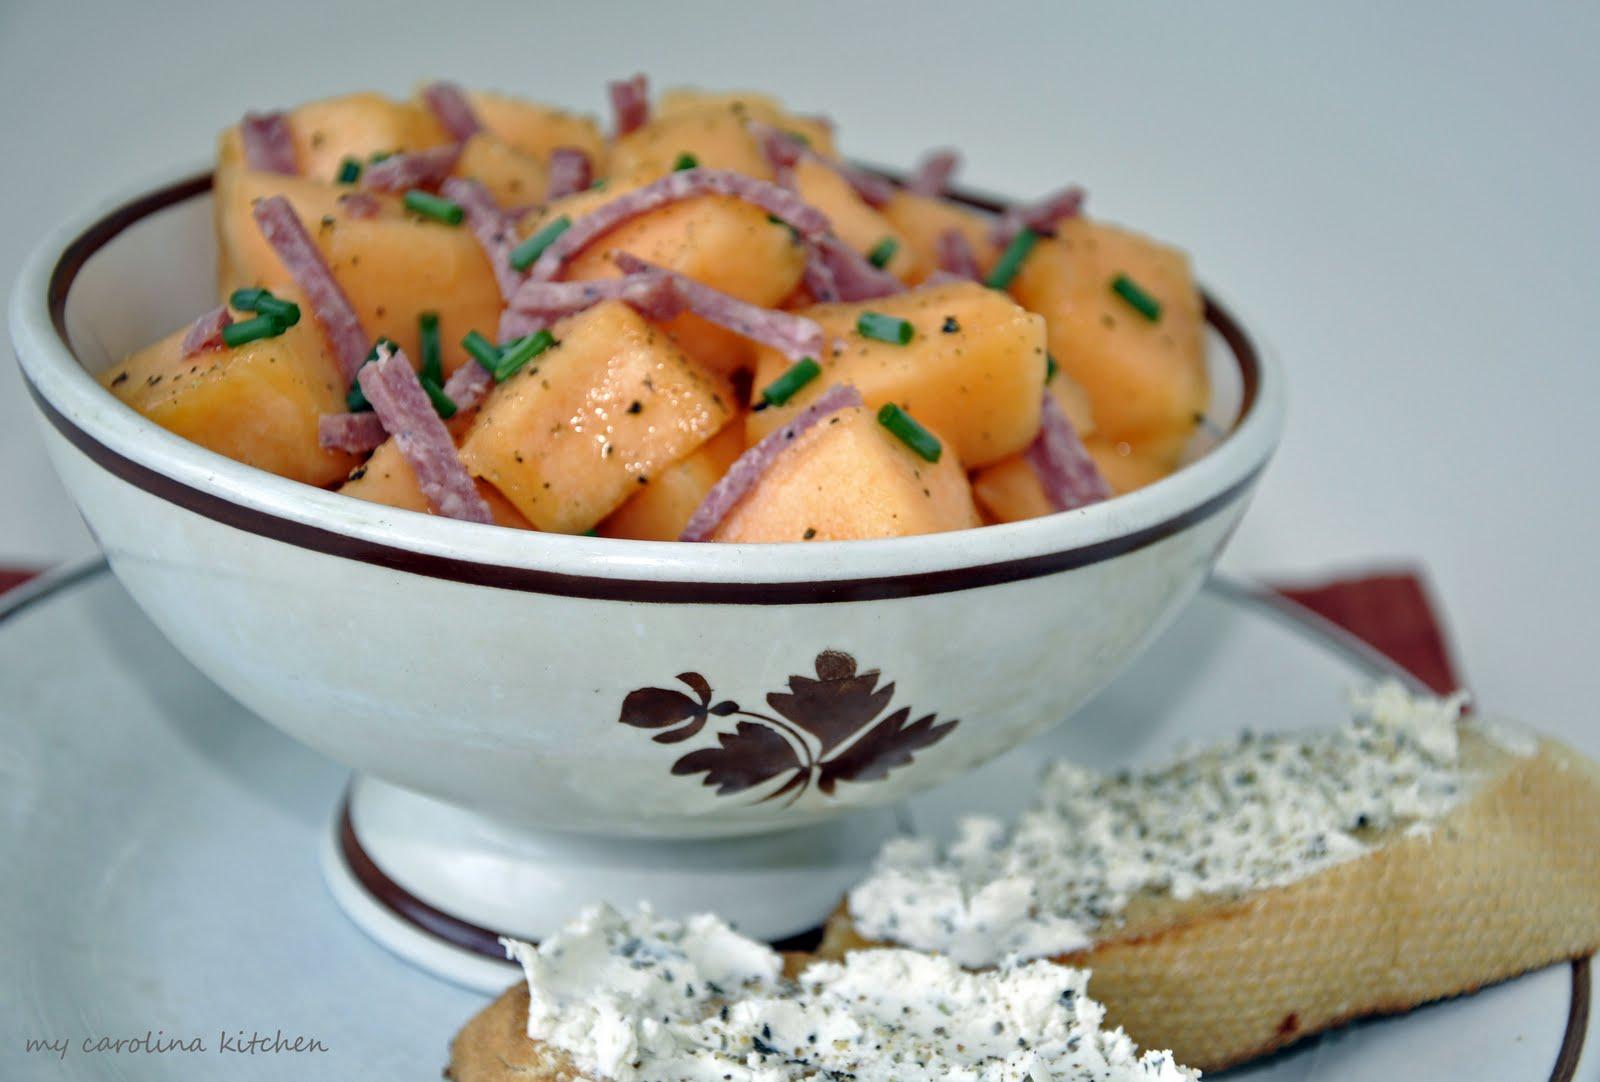 My Carolina Kitchen: An Easy Italian Appetizer - Savory Cantaloupe Salad